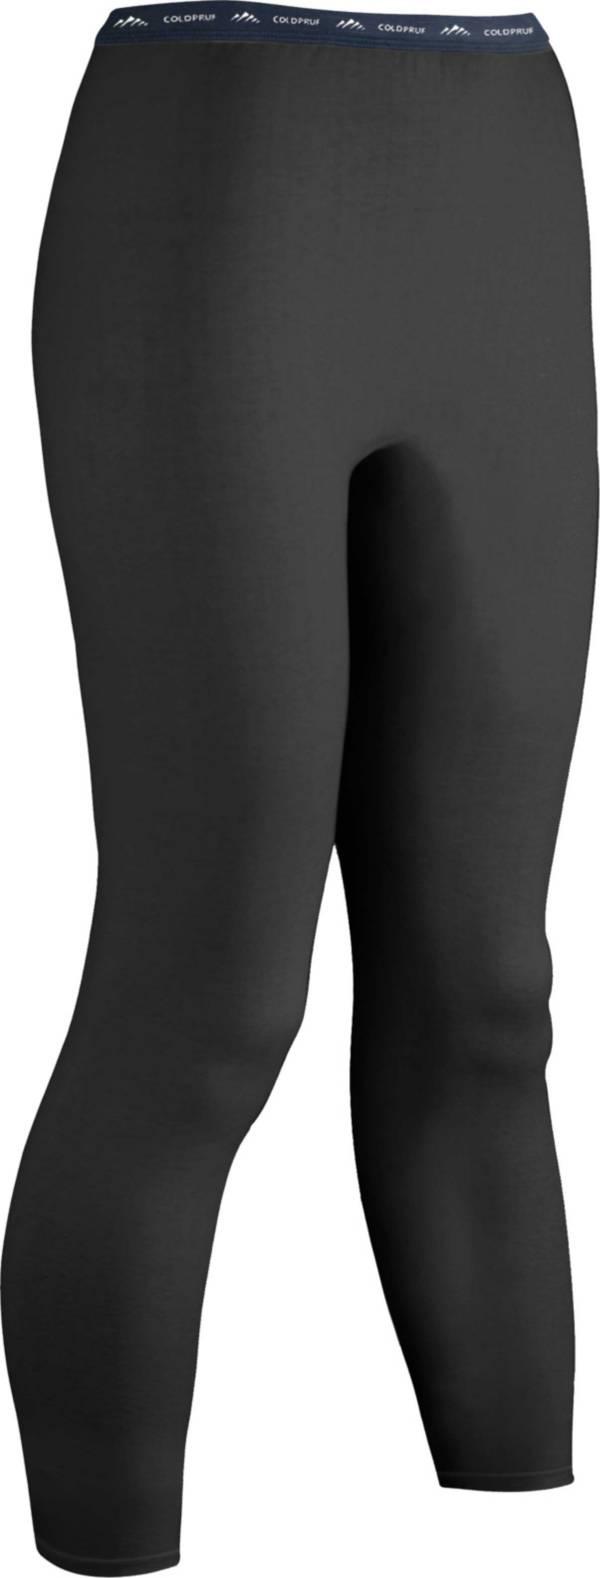 ColdPruf Women's Plus Size Platinum Baselayer Pants product image